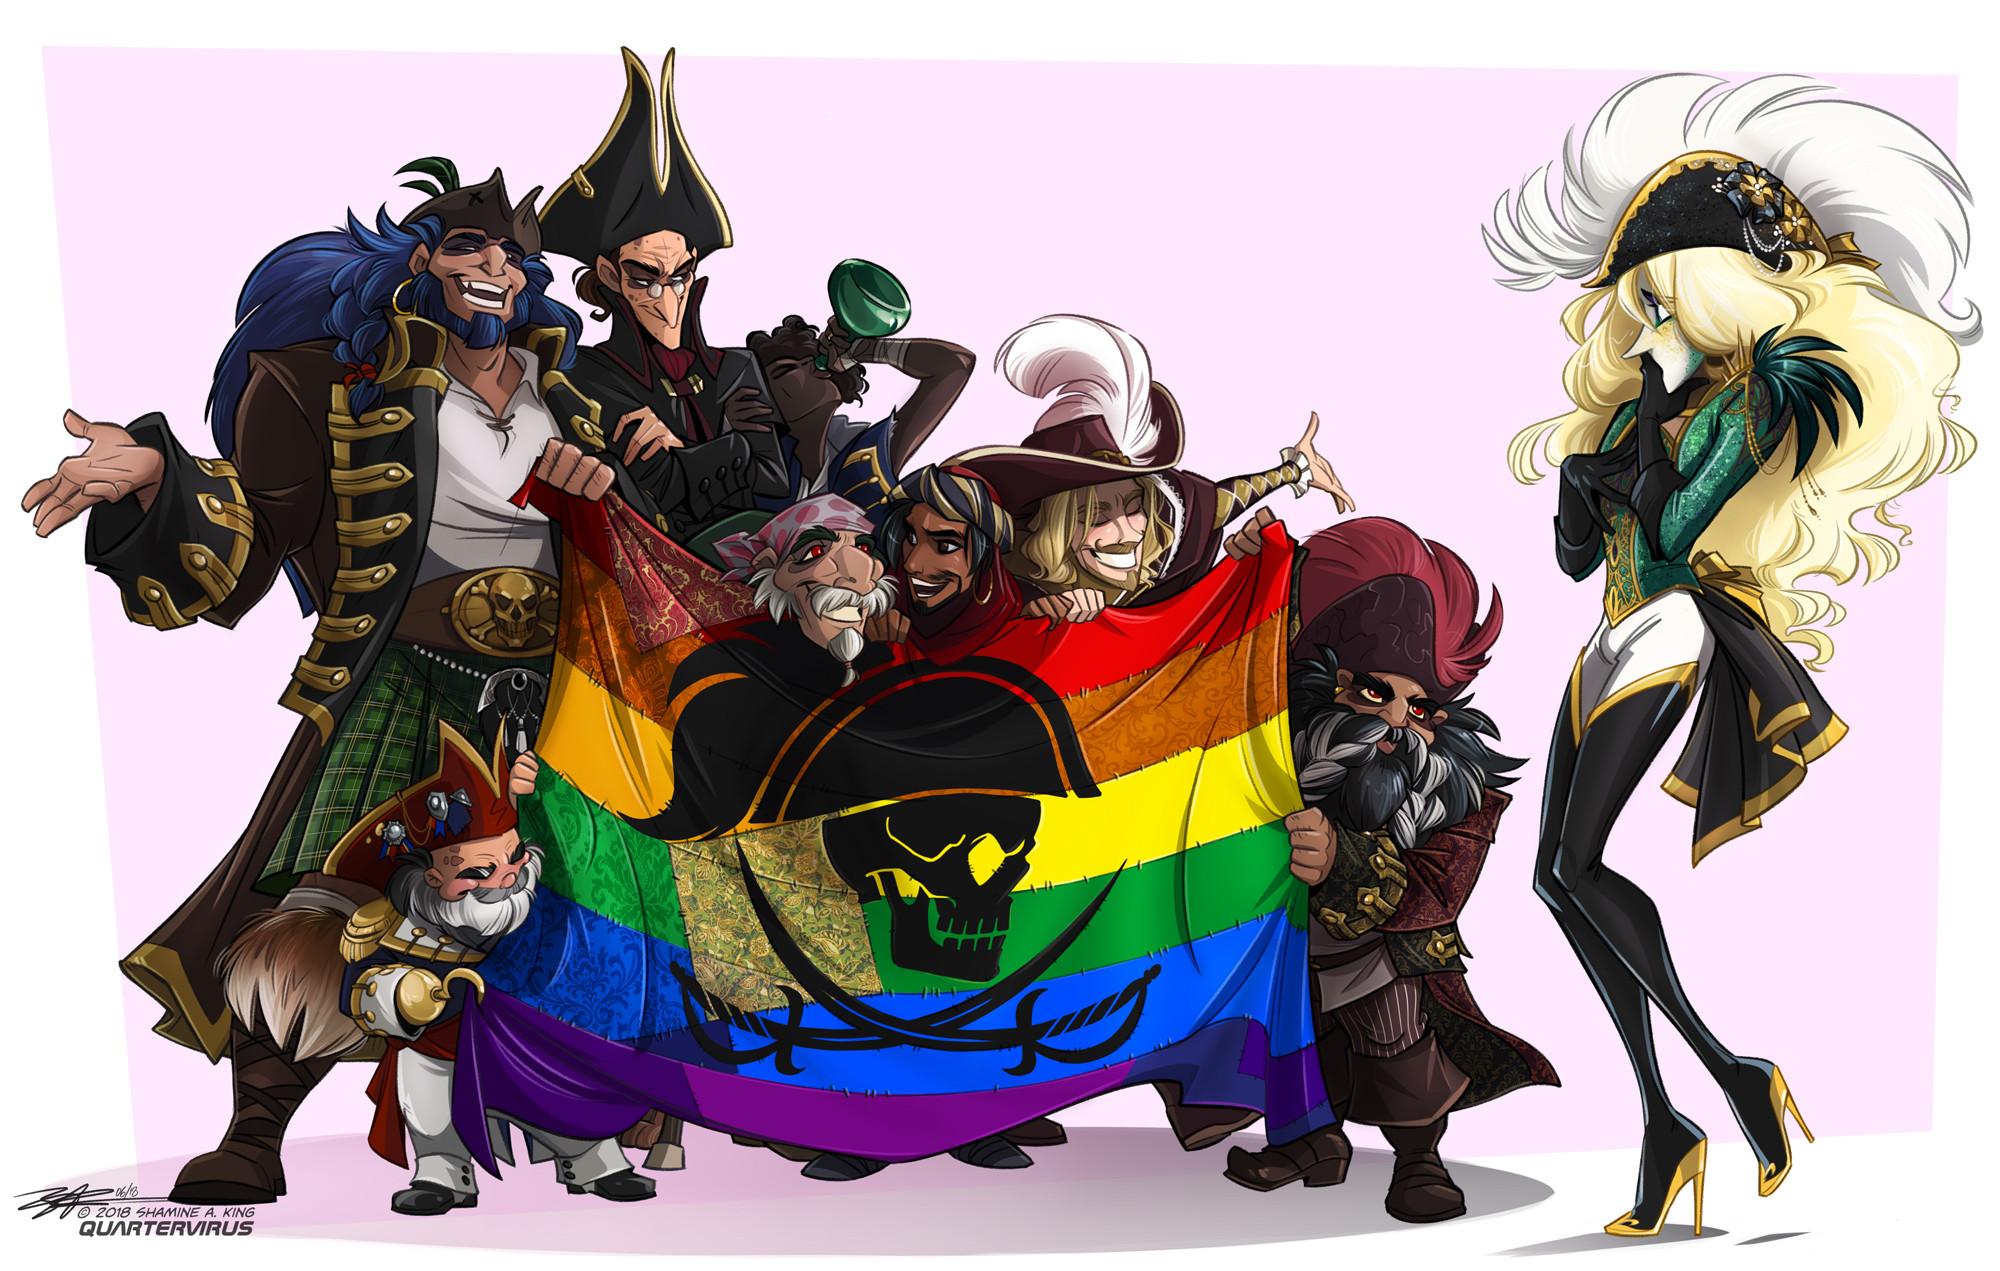 Pride Pirates - all aboard the HMS Allies!